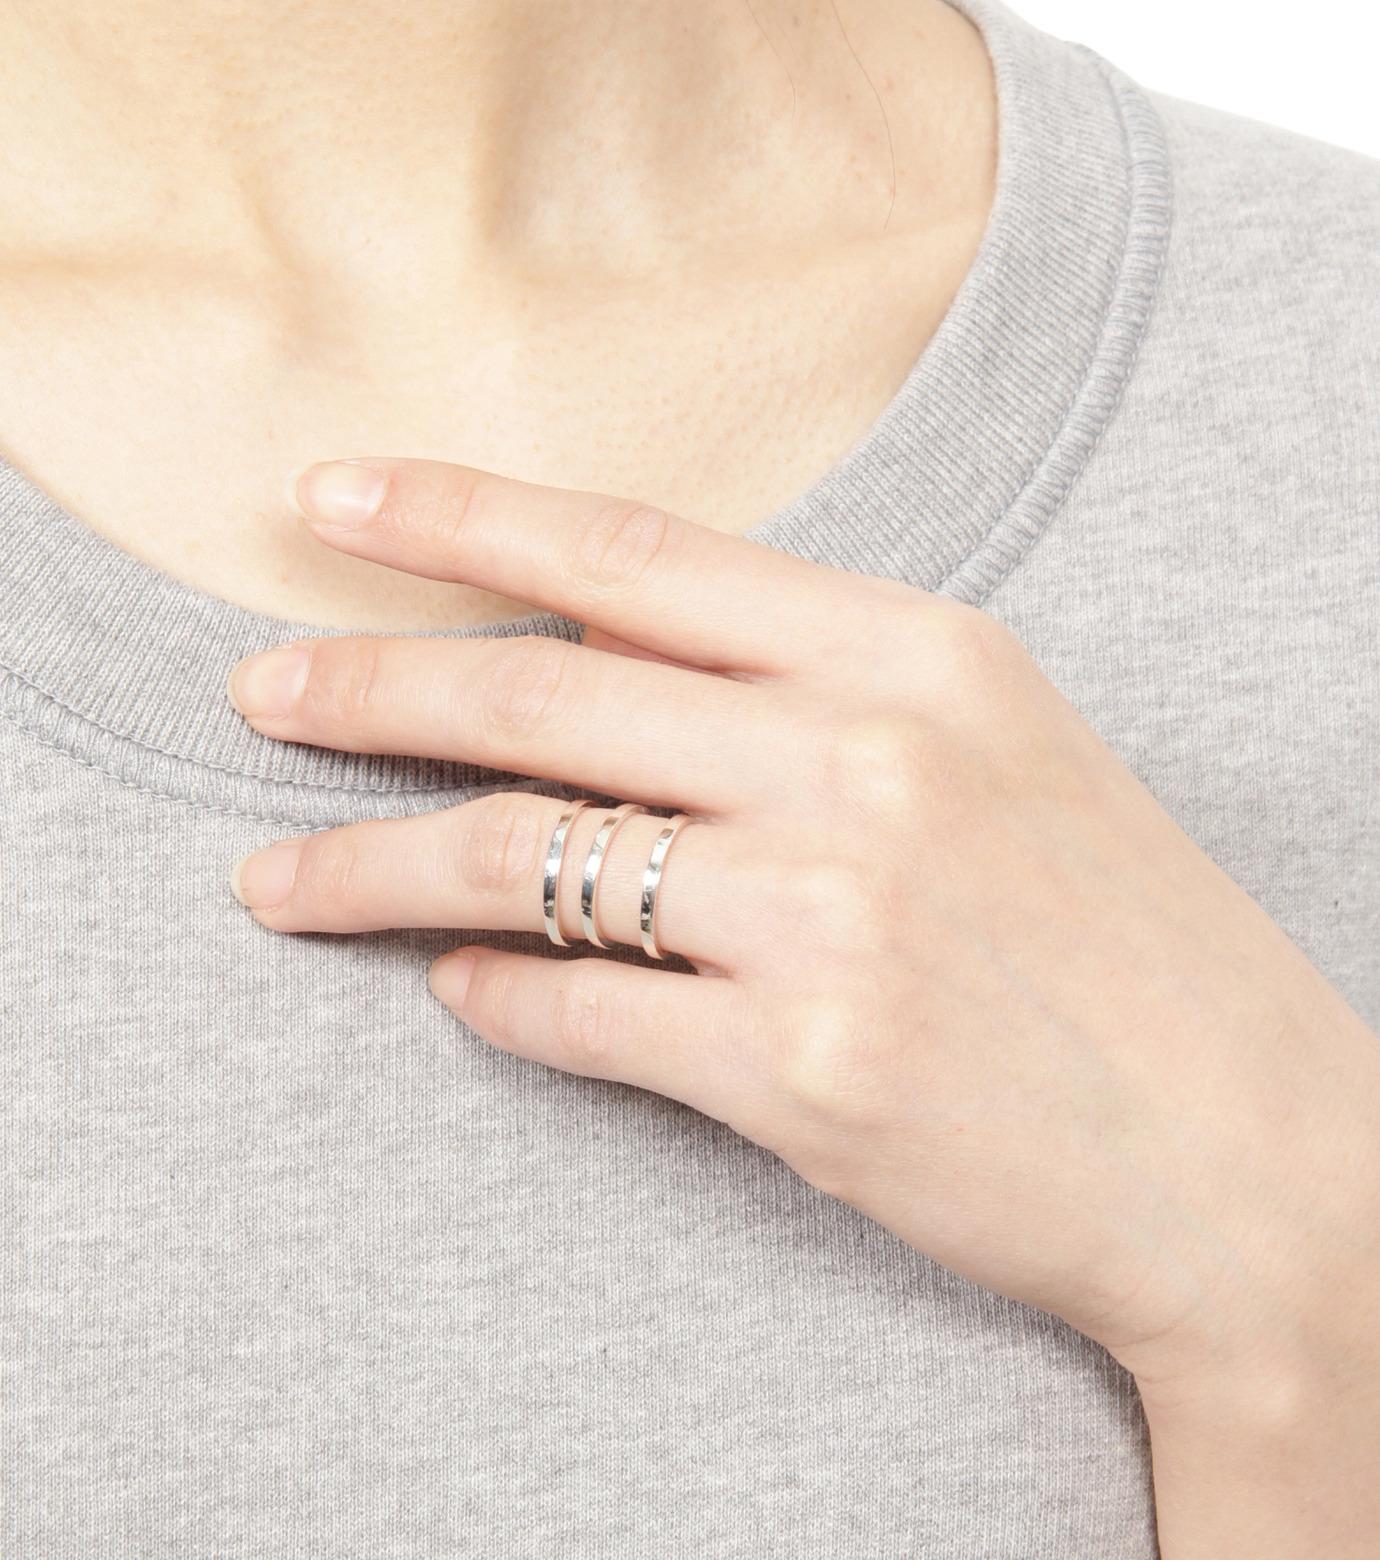 Campbell(キャンベル)のTribar Ring-SILVER(アクセサリー/accessory)-TRIBAR-RING-1 拡大詳細画像4